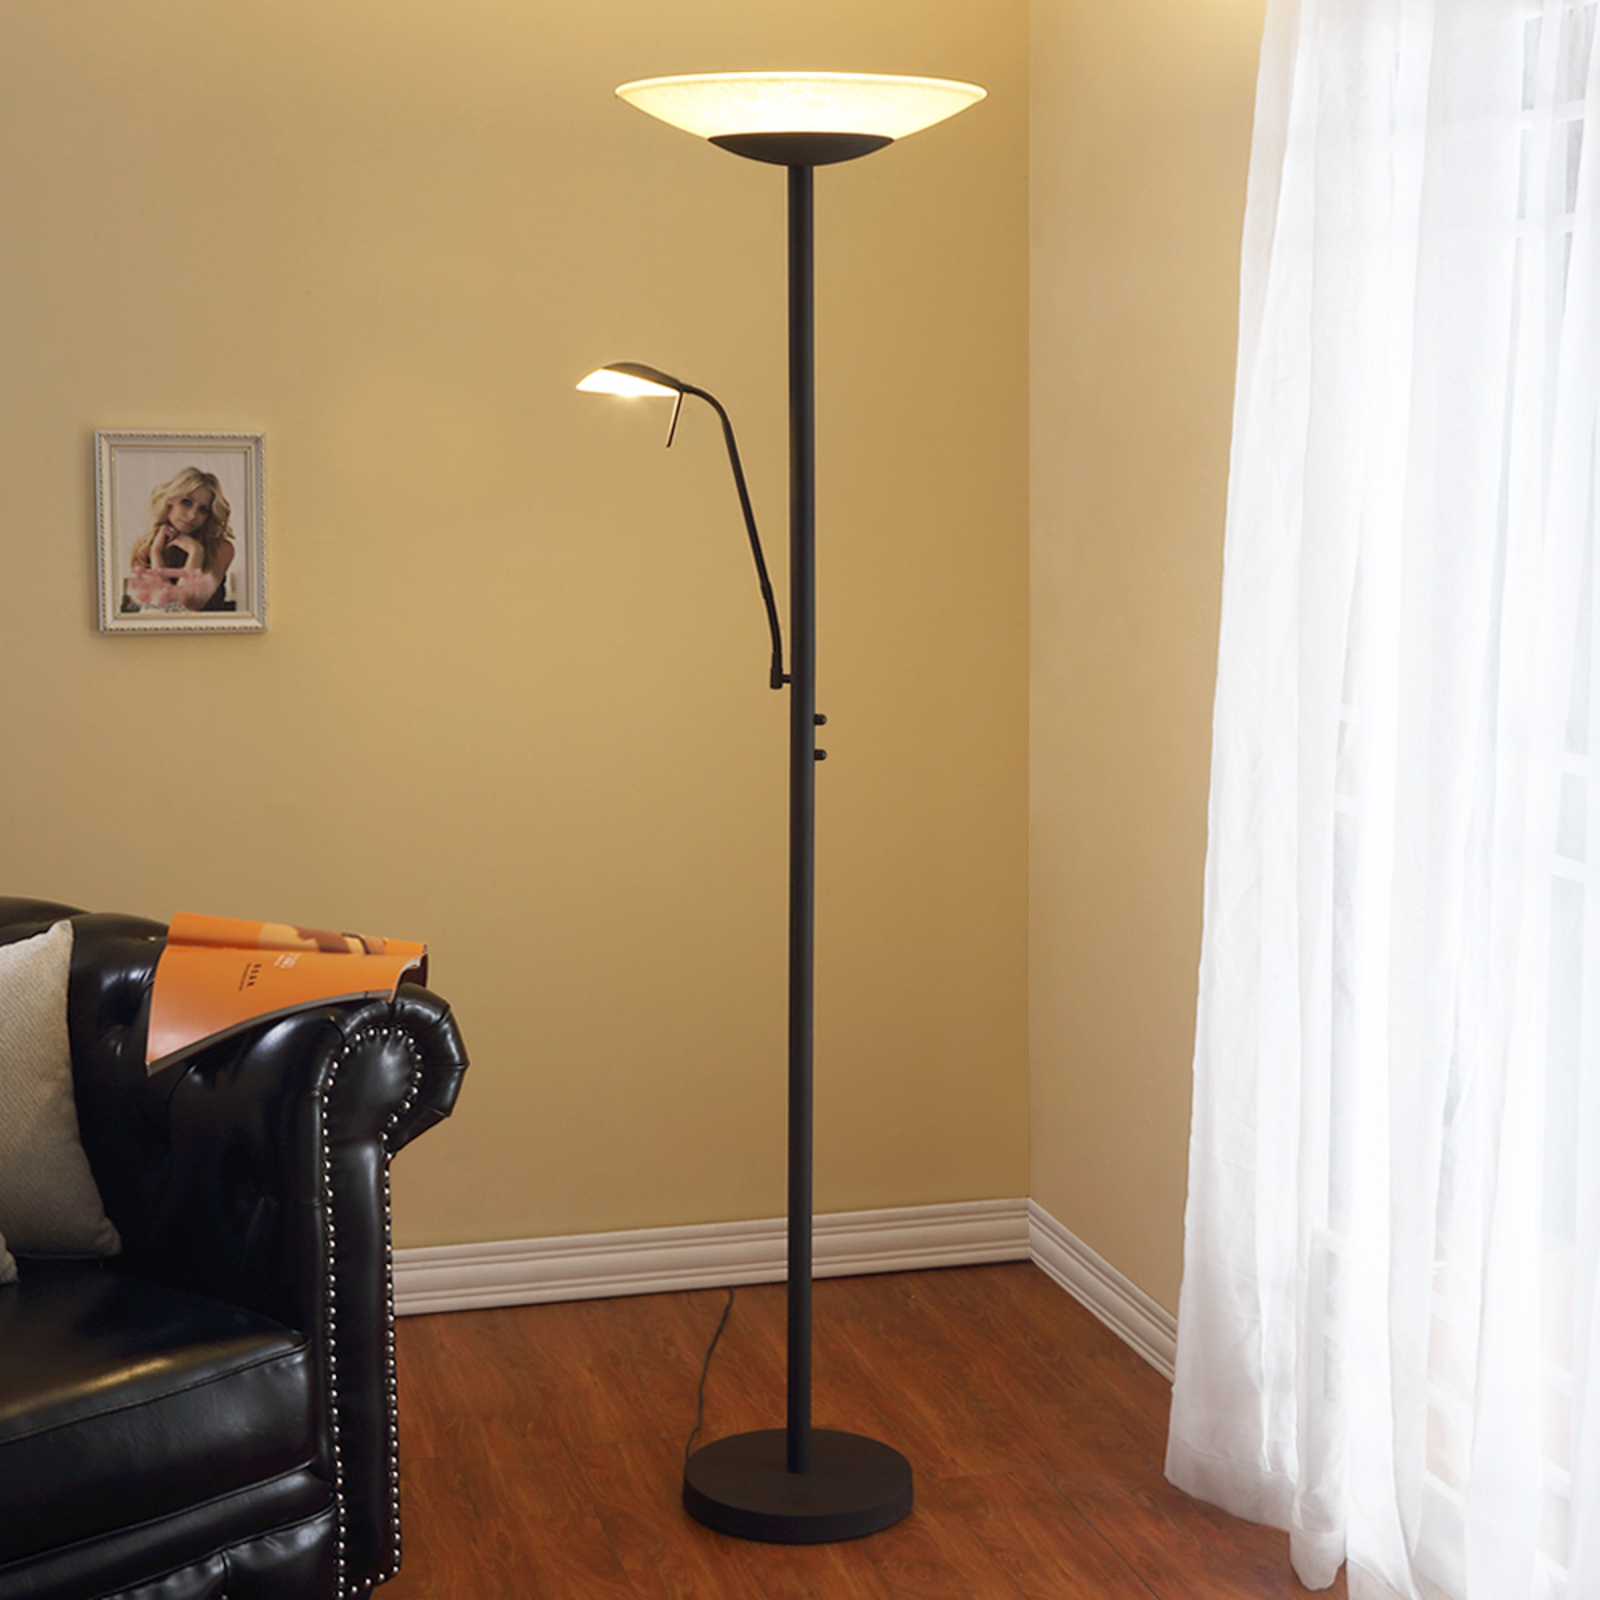 Lampa LED oświetlająca sufit Ragna z lampką, rdza